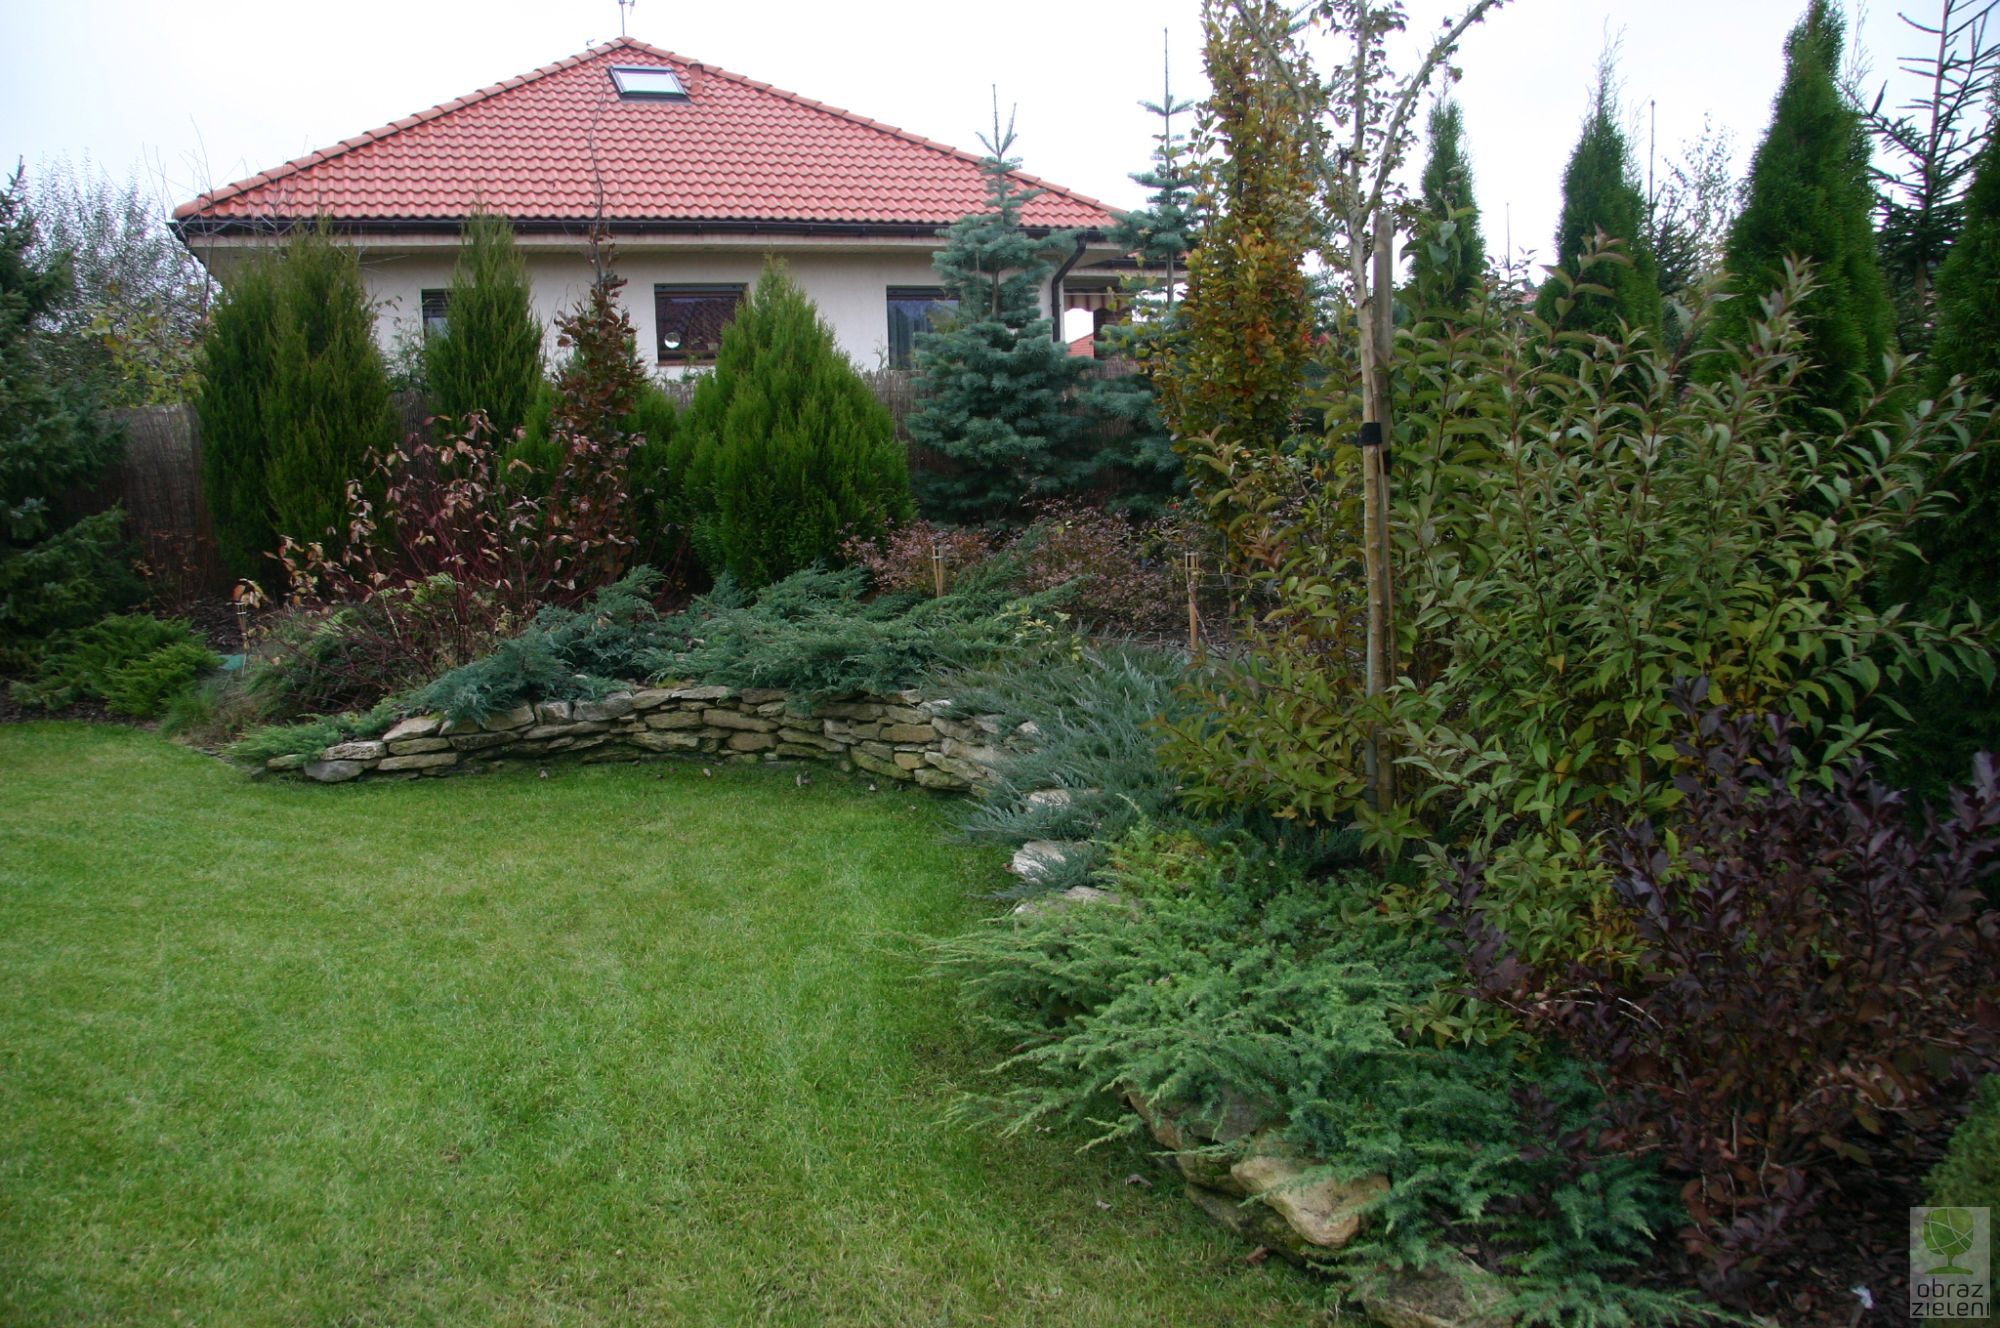 Ogród podmiejski